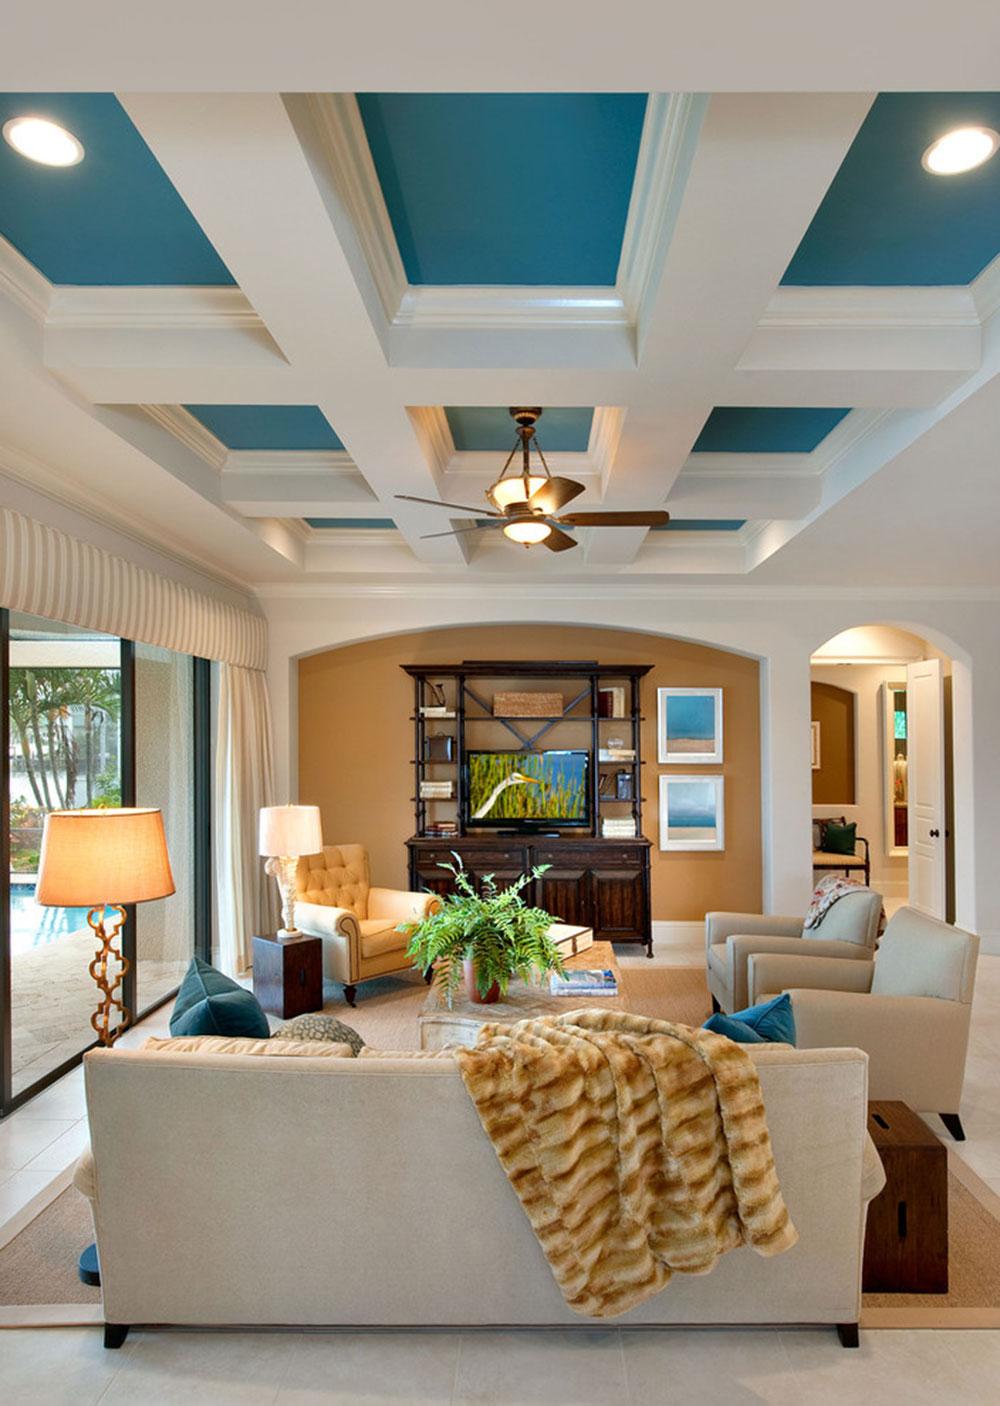 Interior-Design-Color-Misconceptions4 Interior Design Color Misconceptions